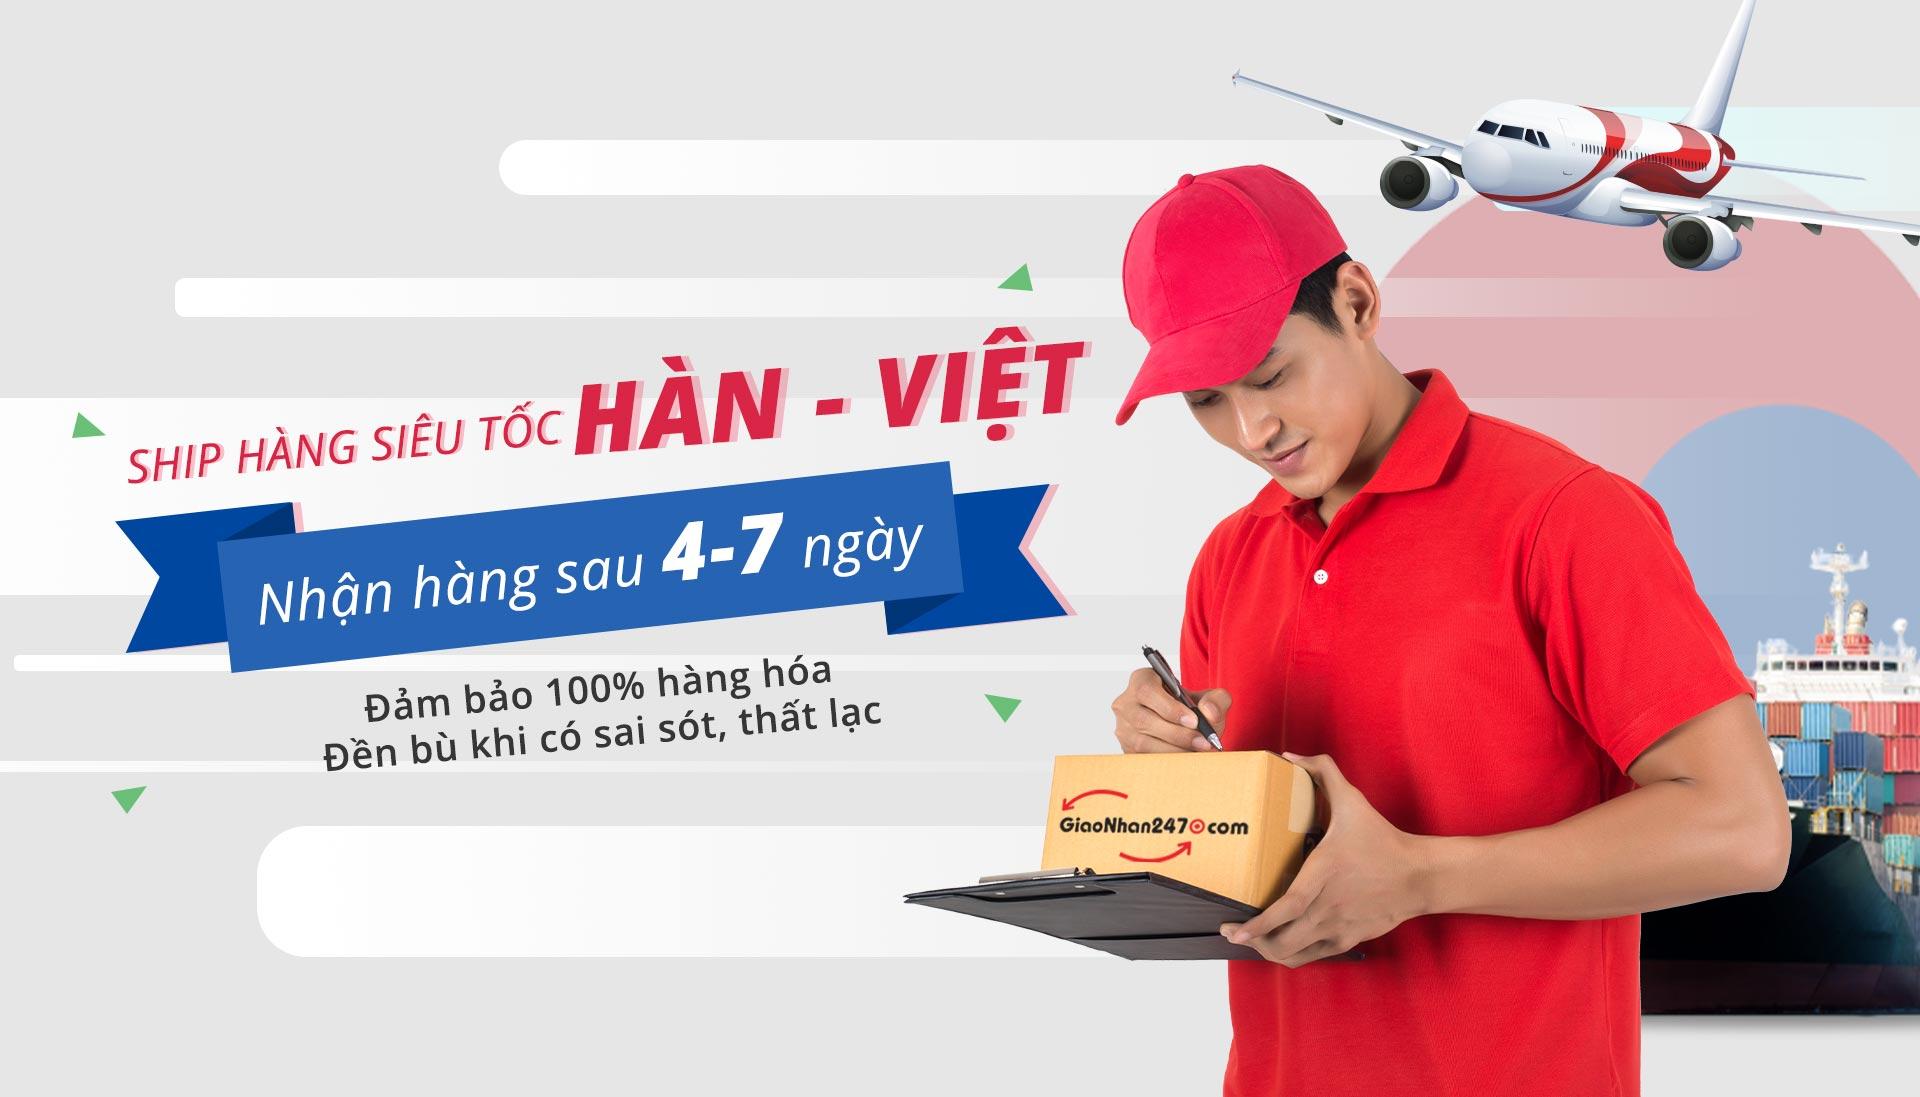 van-chuyen-sieu-toc-hang-hoa-han-vietnam